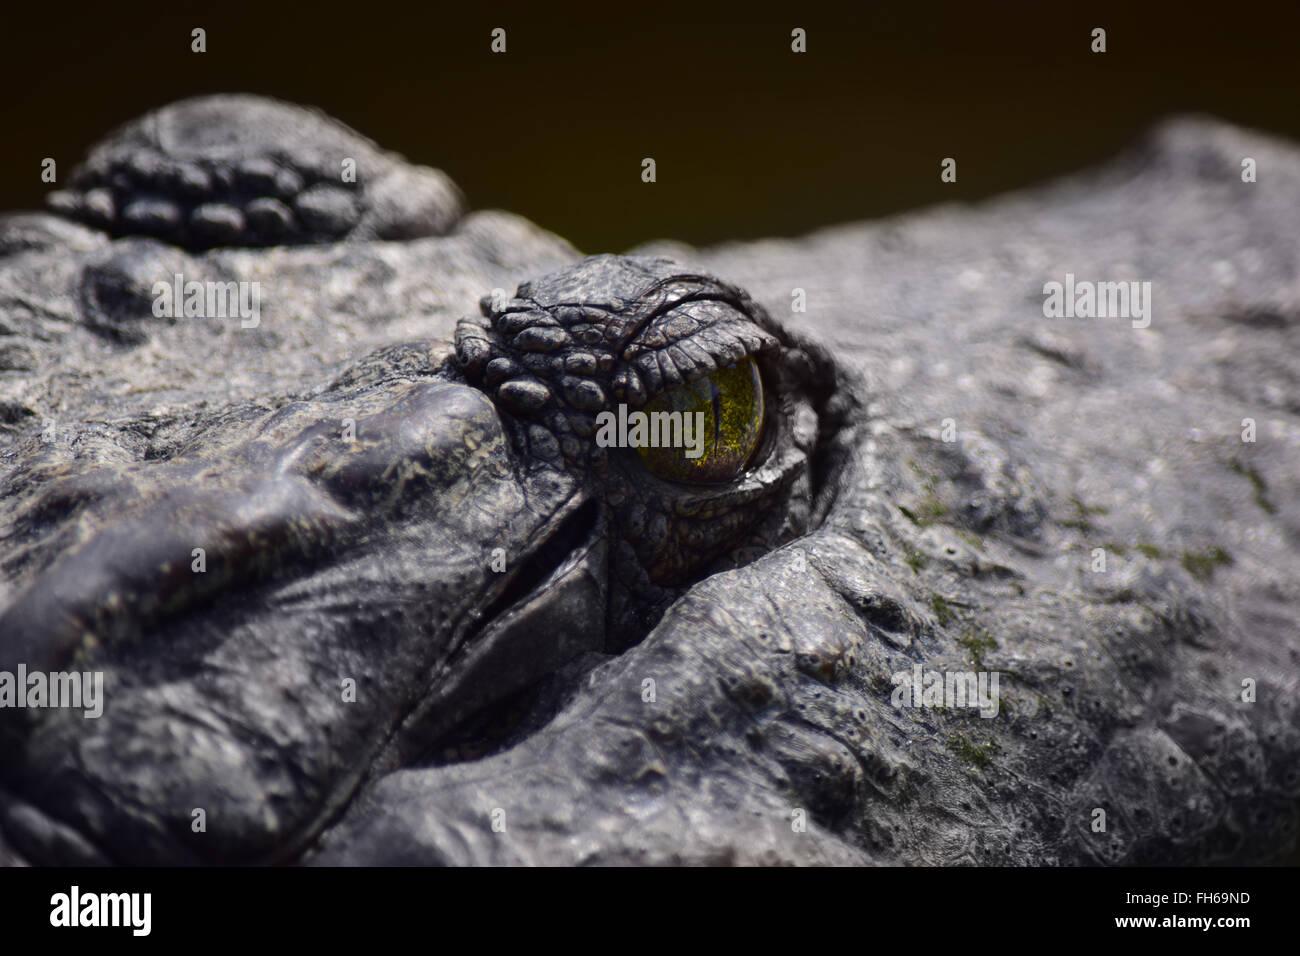 Crocodile Eye Closeup - Stock Image